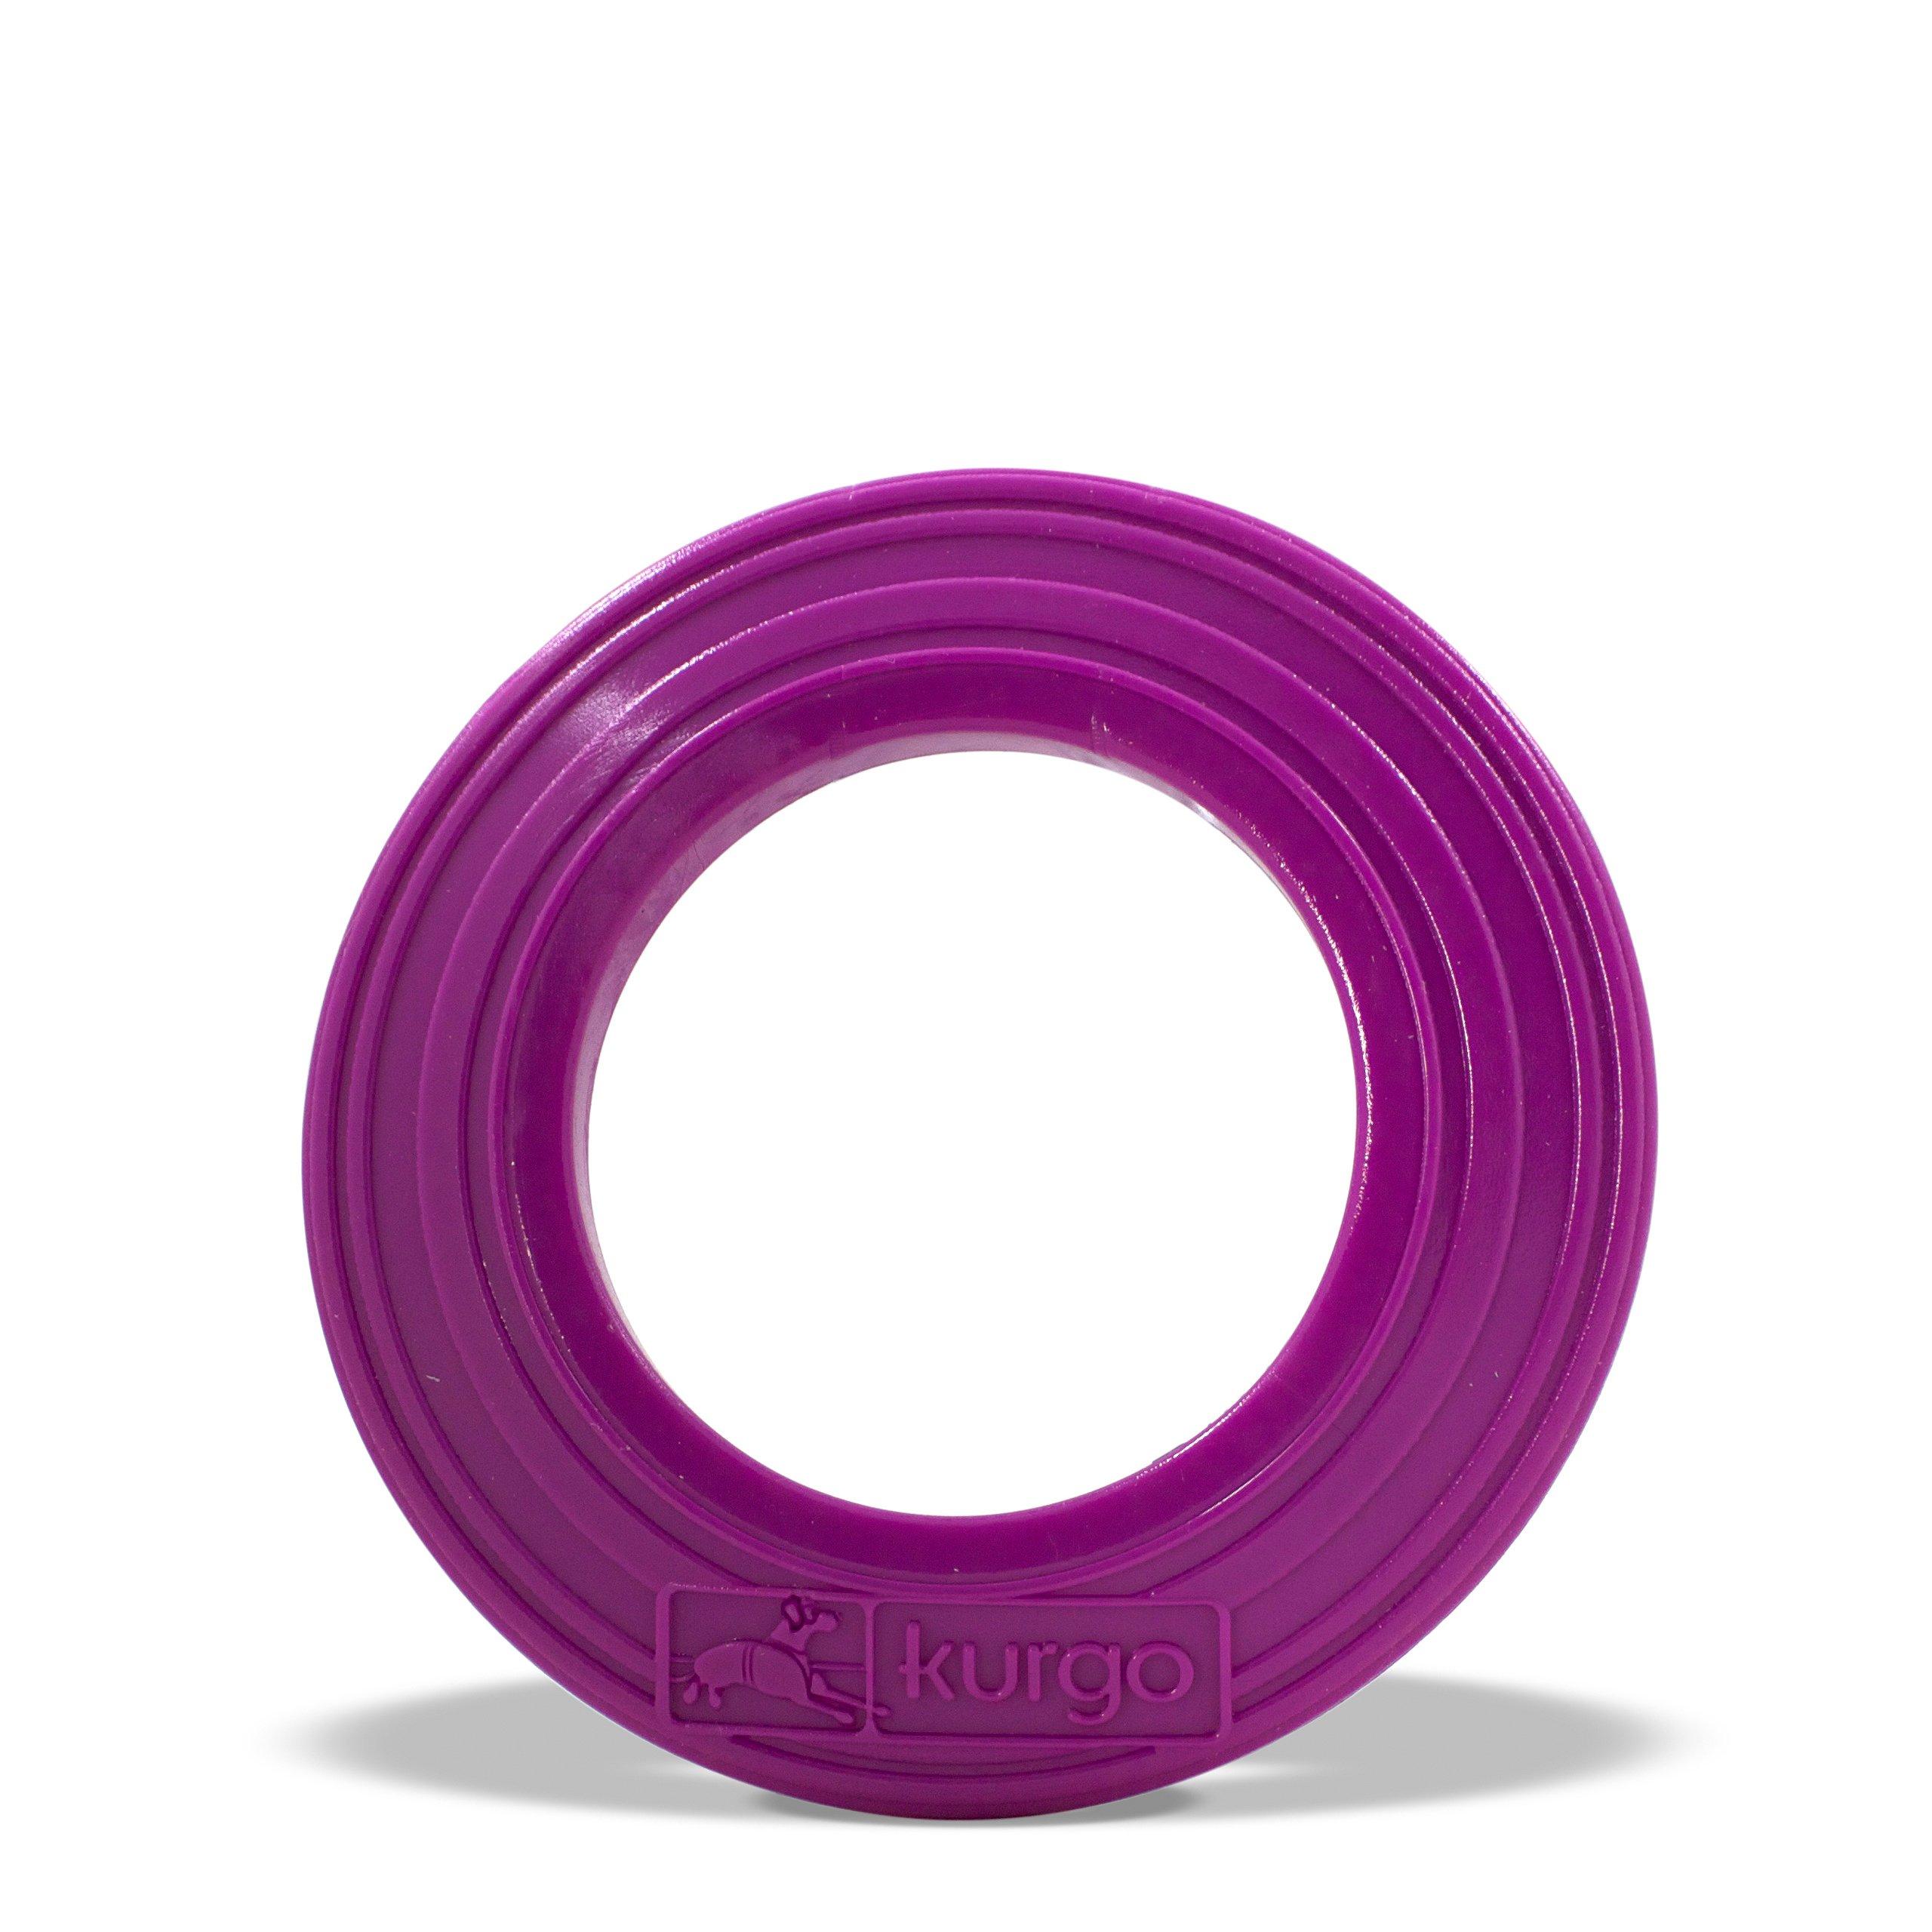 Kurgo Dog Tossing Disc(TM) for Dogs, Just Violet Purple, Regular